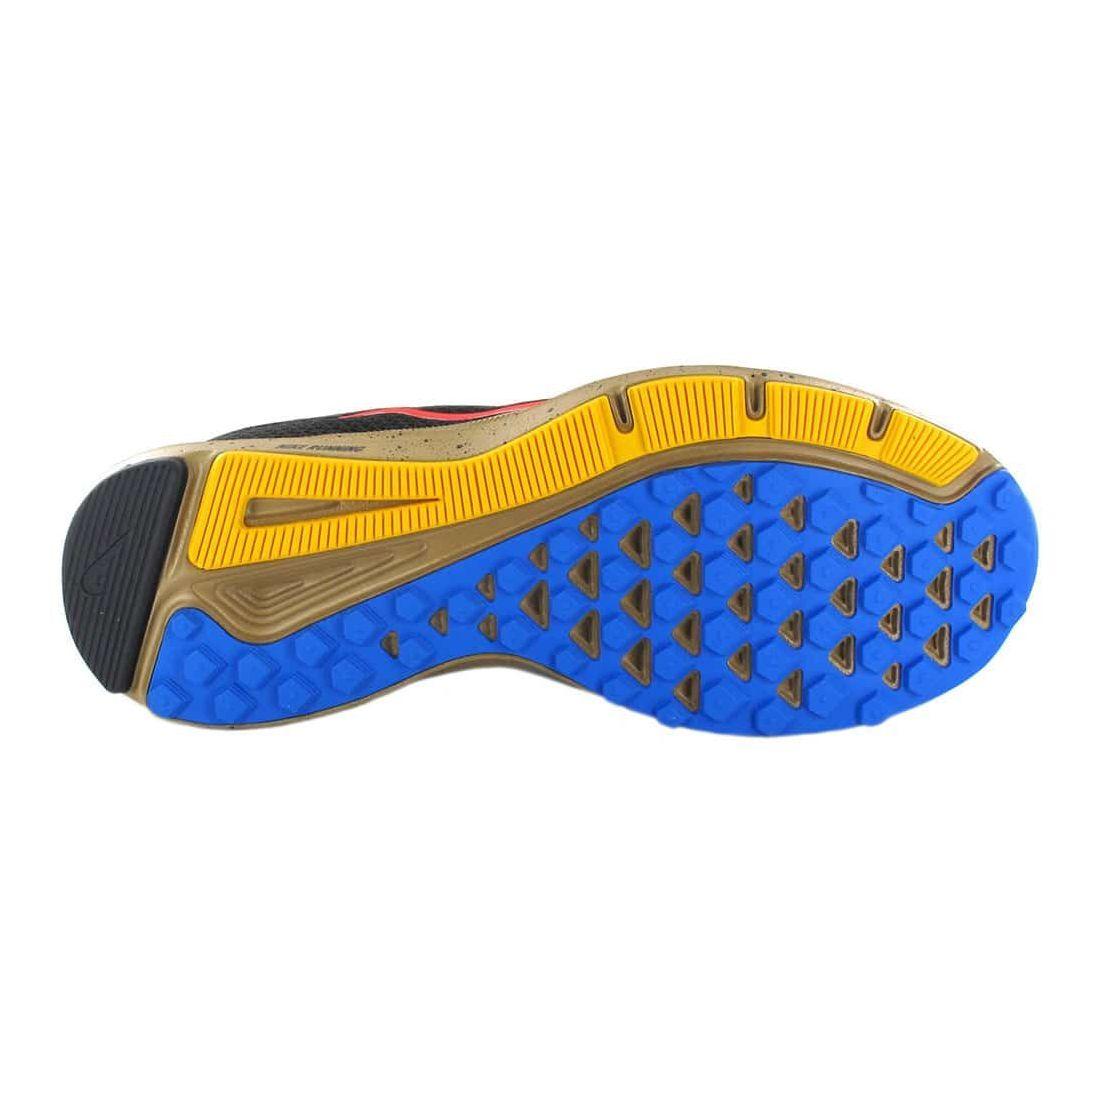 Transparentemente Lustre protesta  Zapatillas Running Hombre - Nike Quest 2 SE negro l Todo-Deporte.com